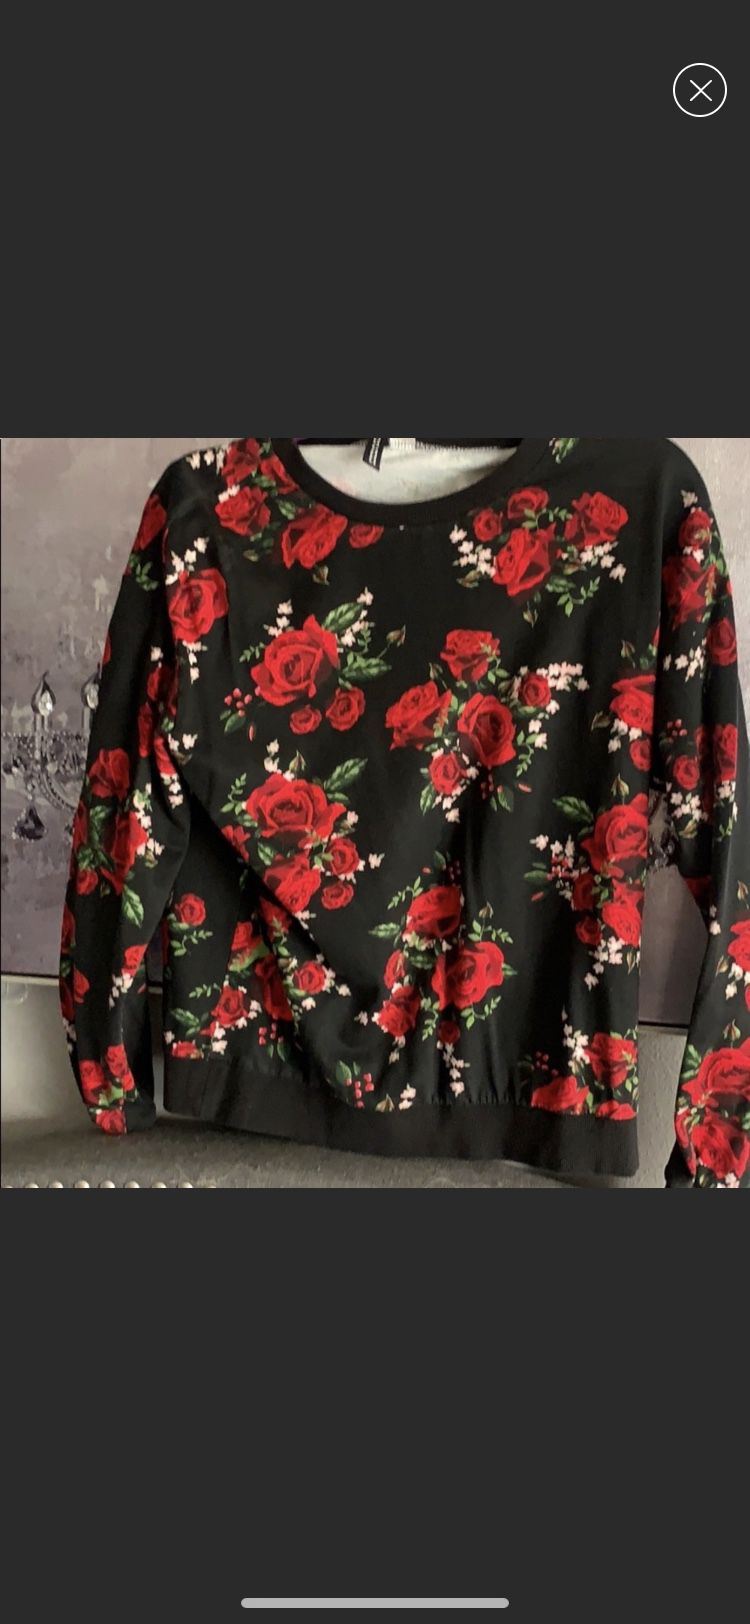 Rockabilly rose sweater vibrant size medium m tattoo